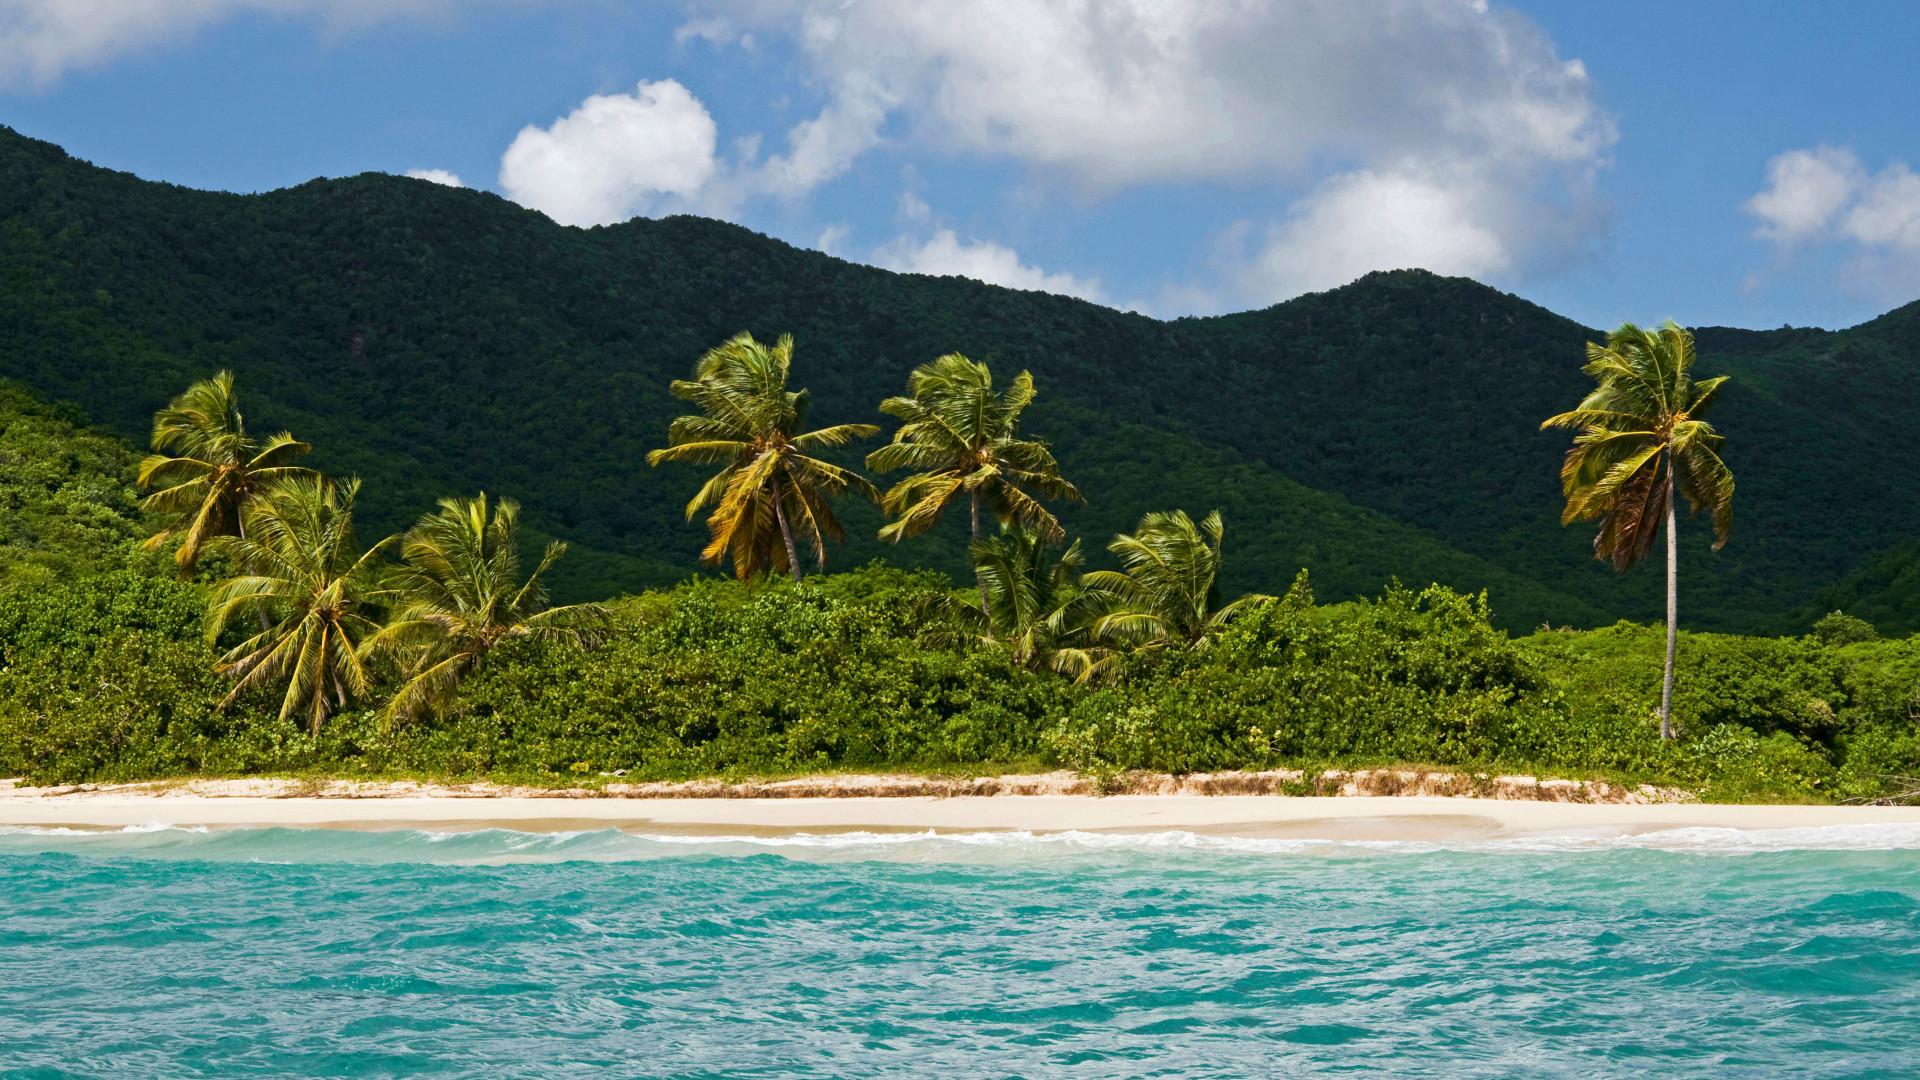 Tobacco Beach in Antigua's South East coast